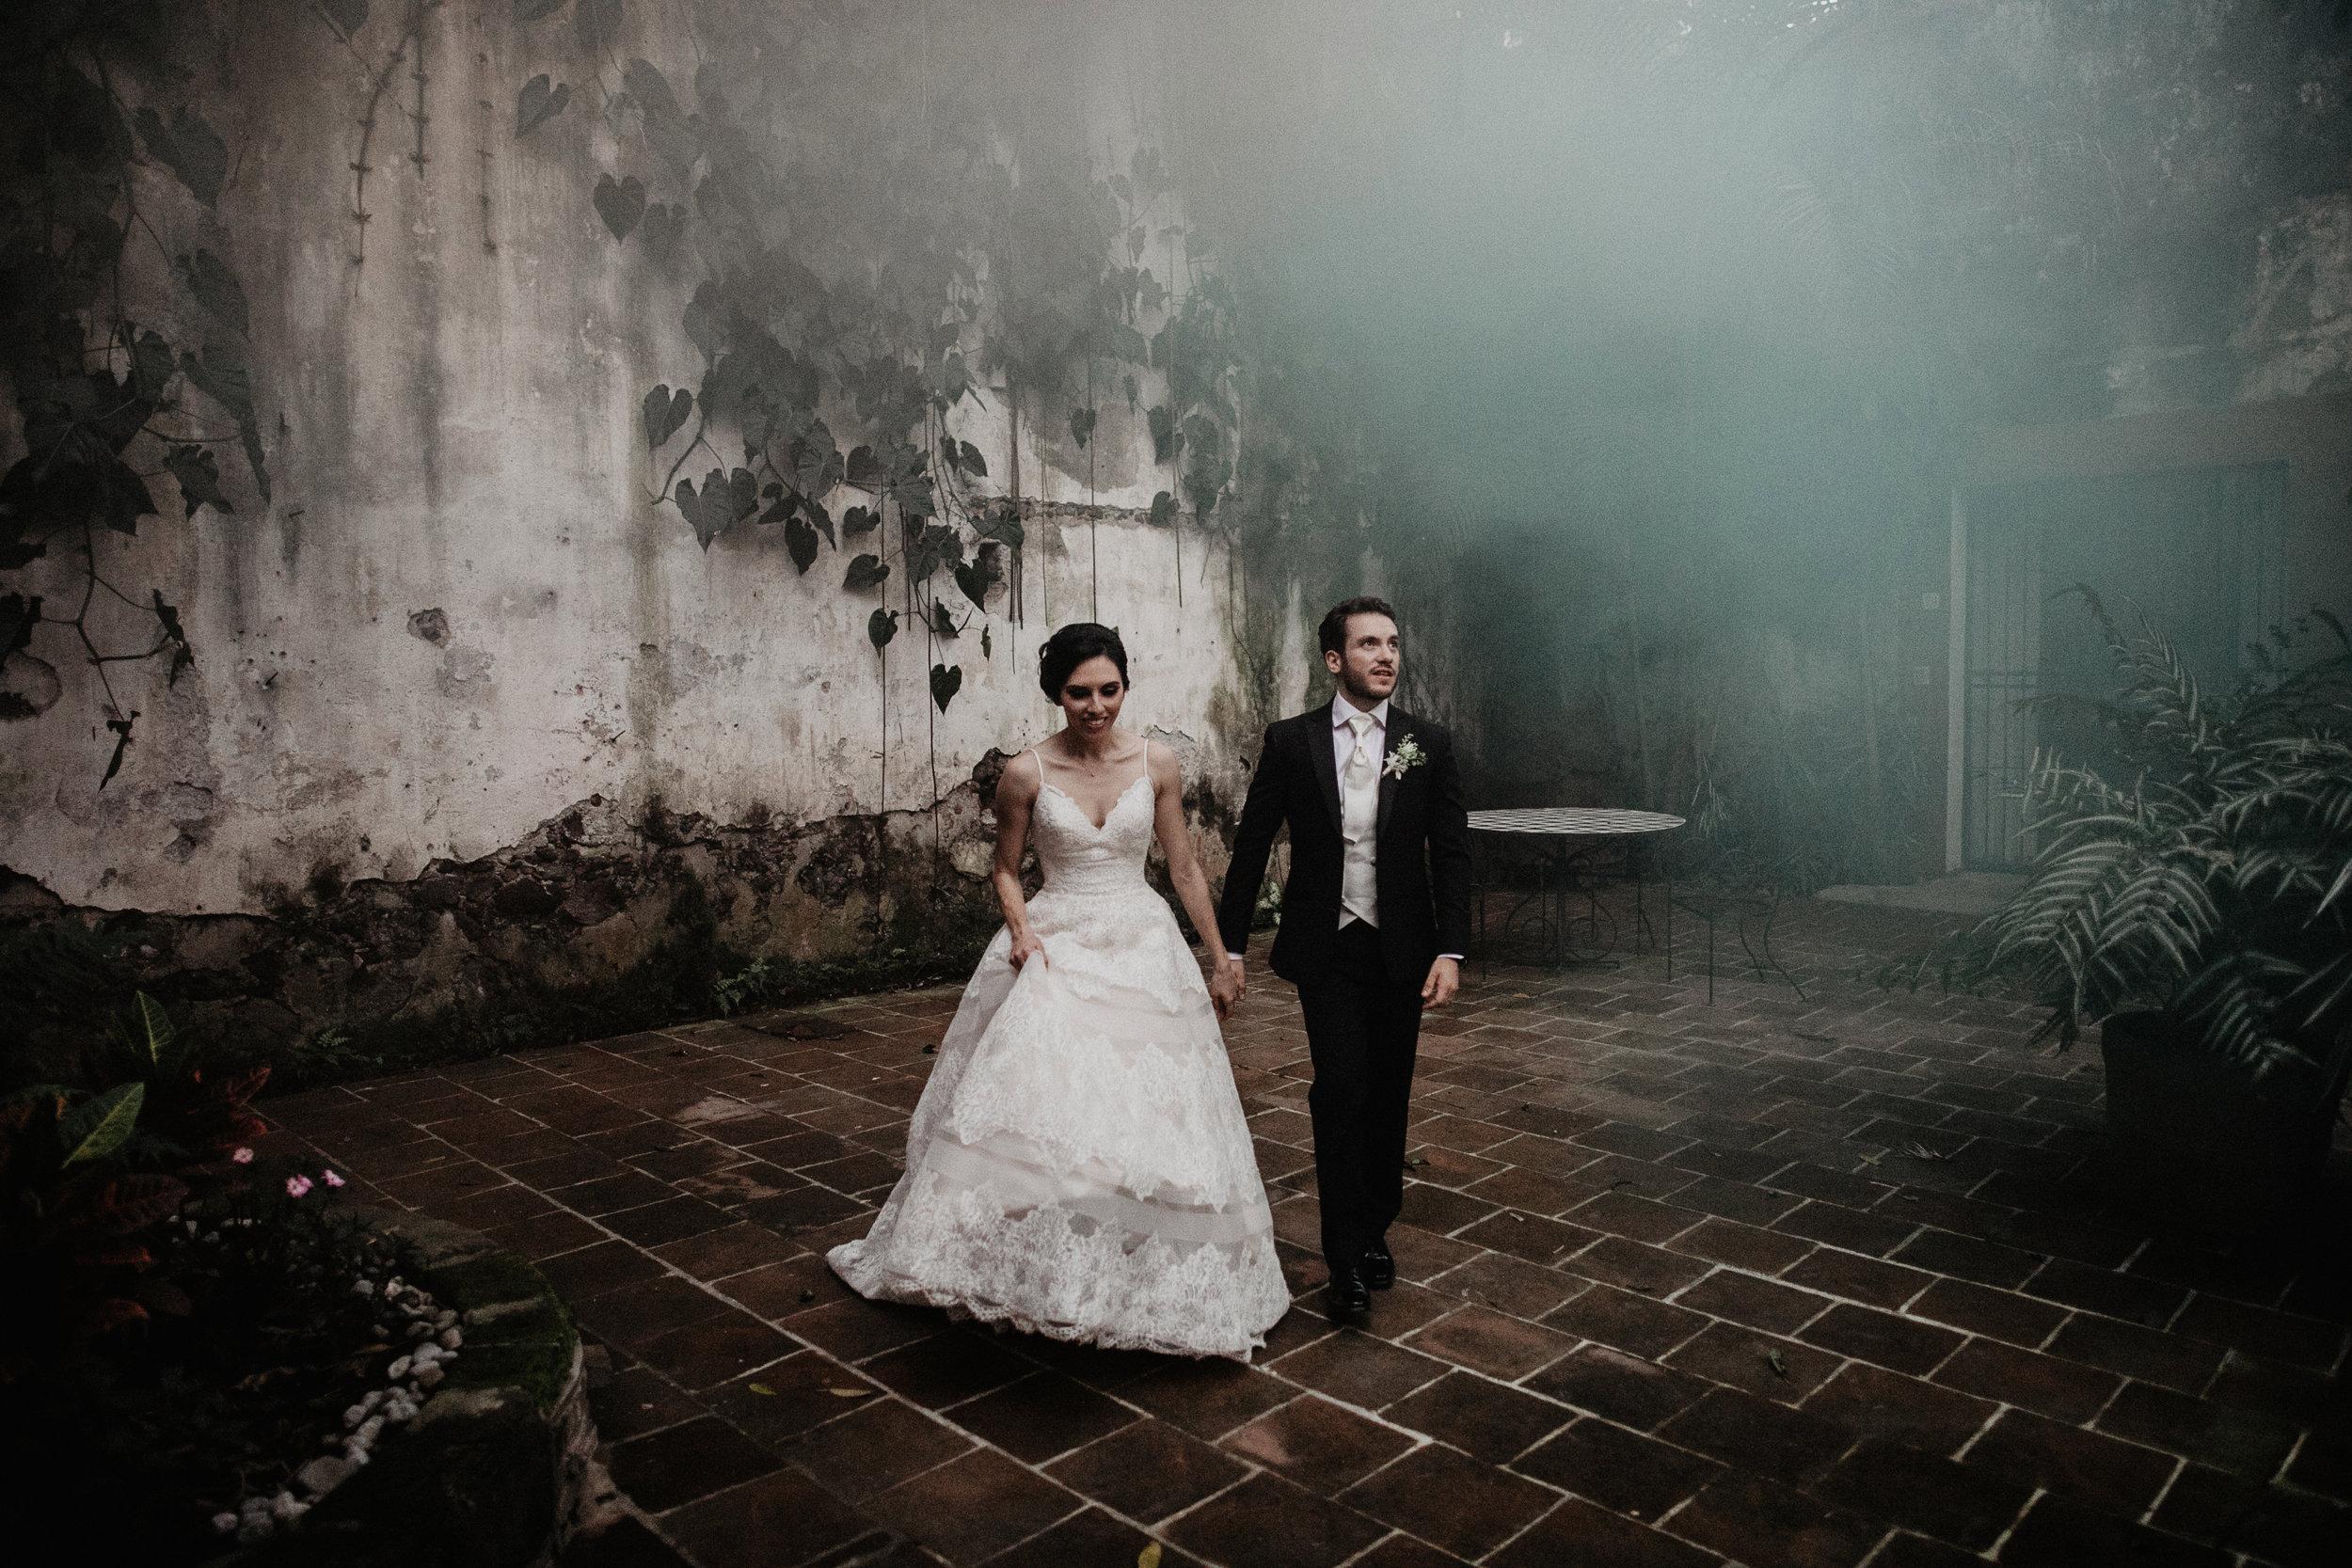 Alfonso_flores_destination_wedding_photography_vanesa_carlos-896.JPG